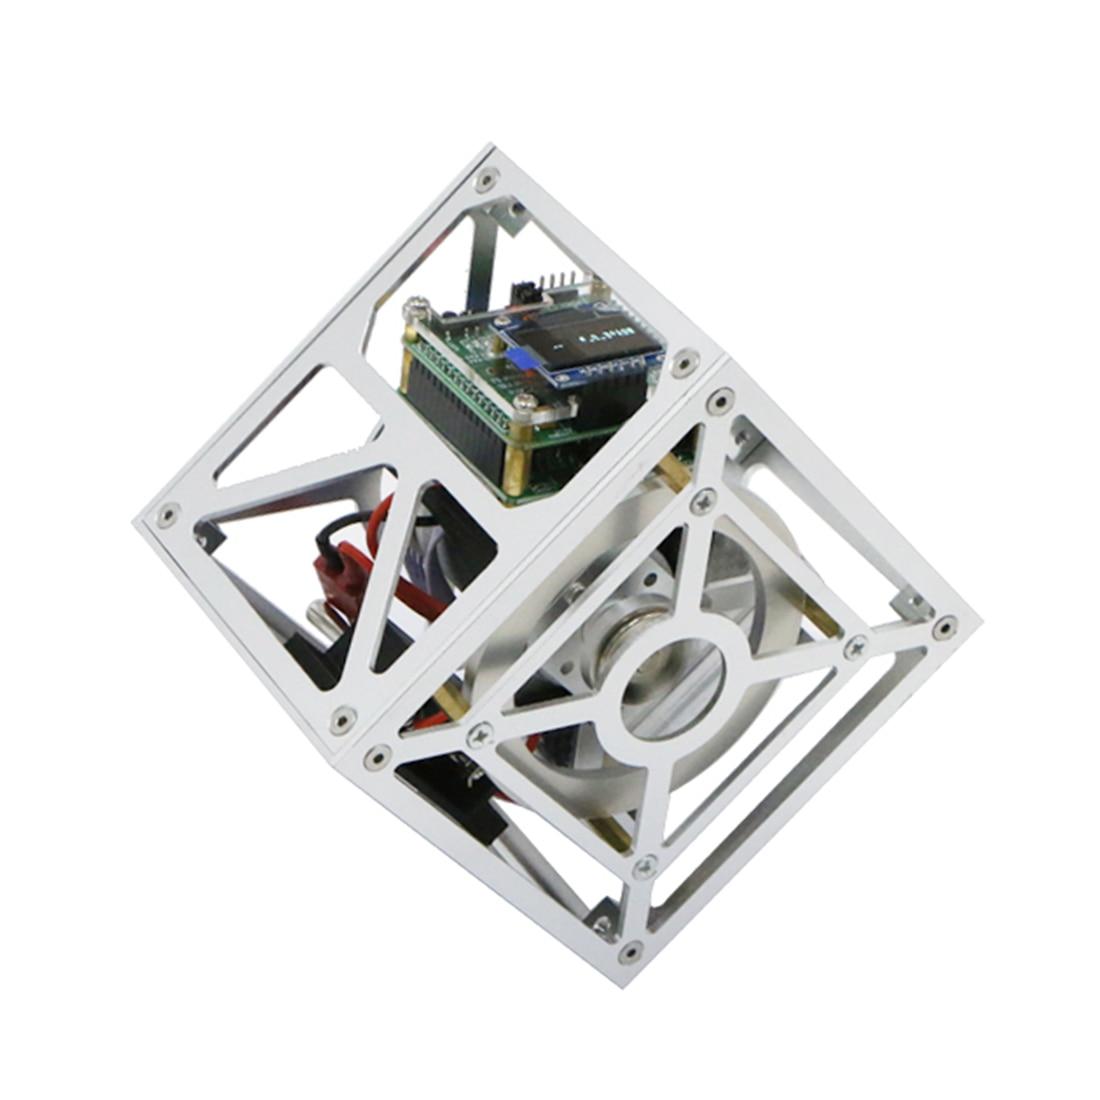 Single Point Balance Block Unilateral Self-Balancing Cubli Bblock Steam Toy